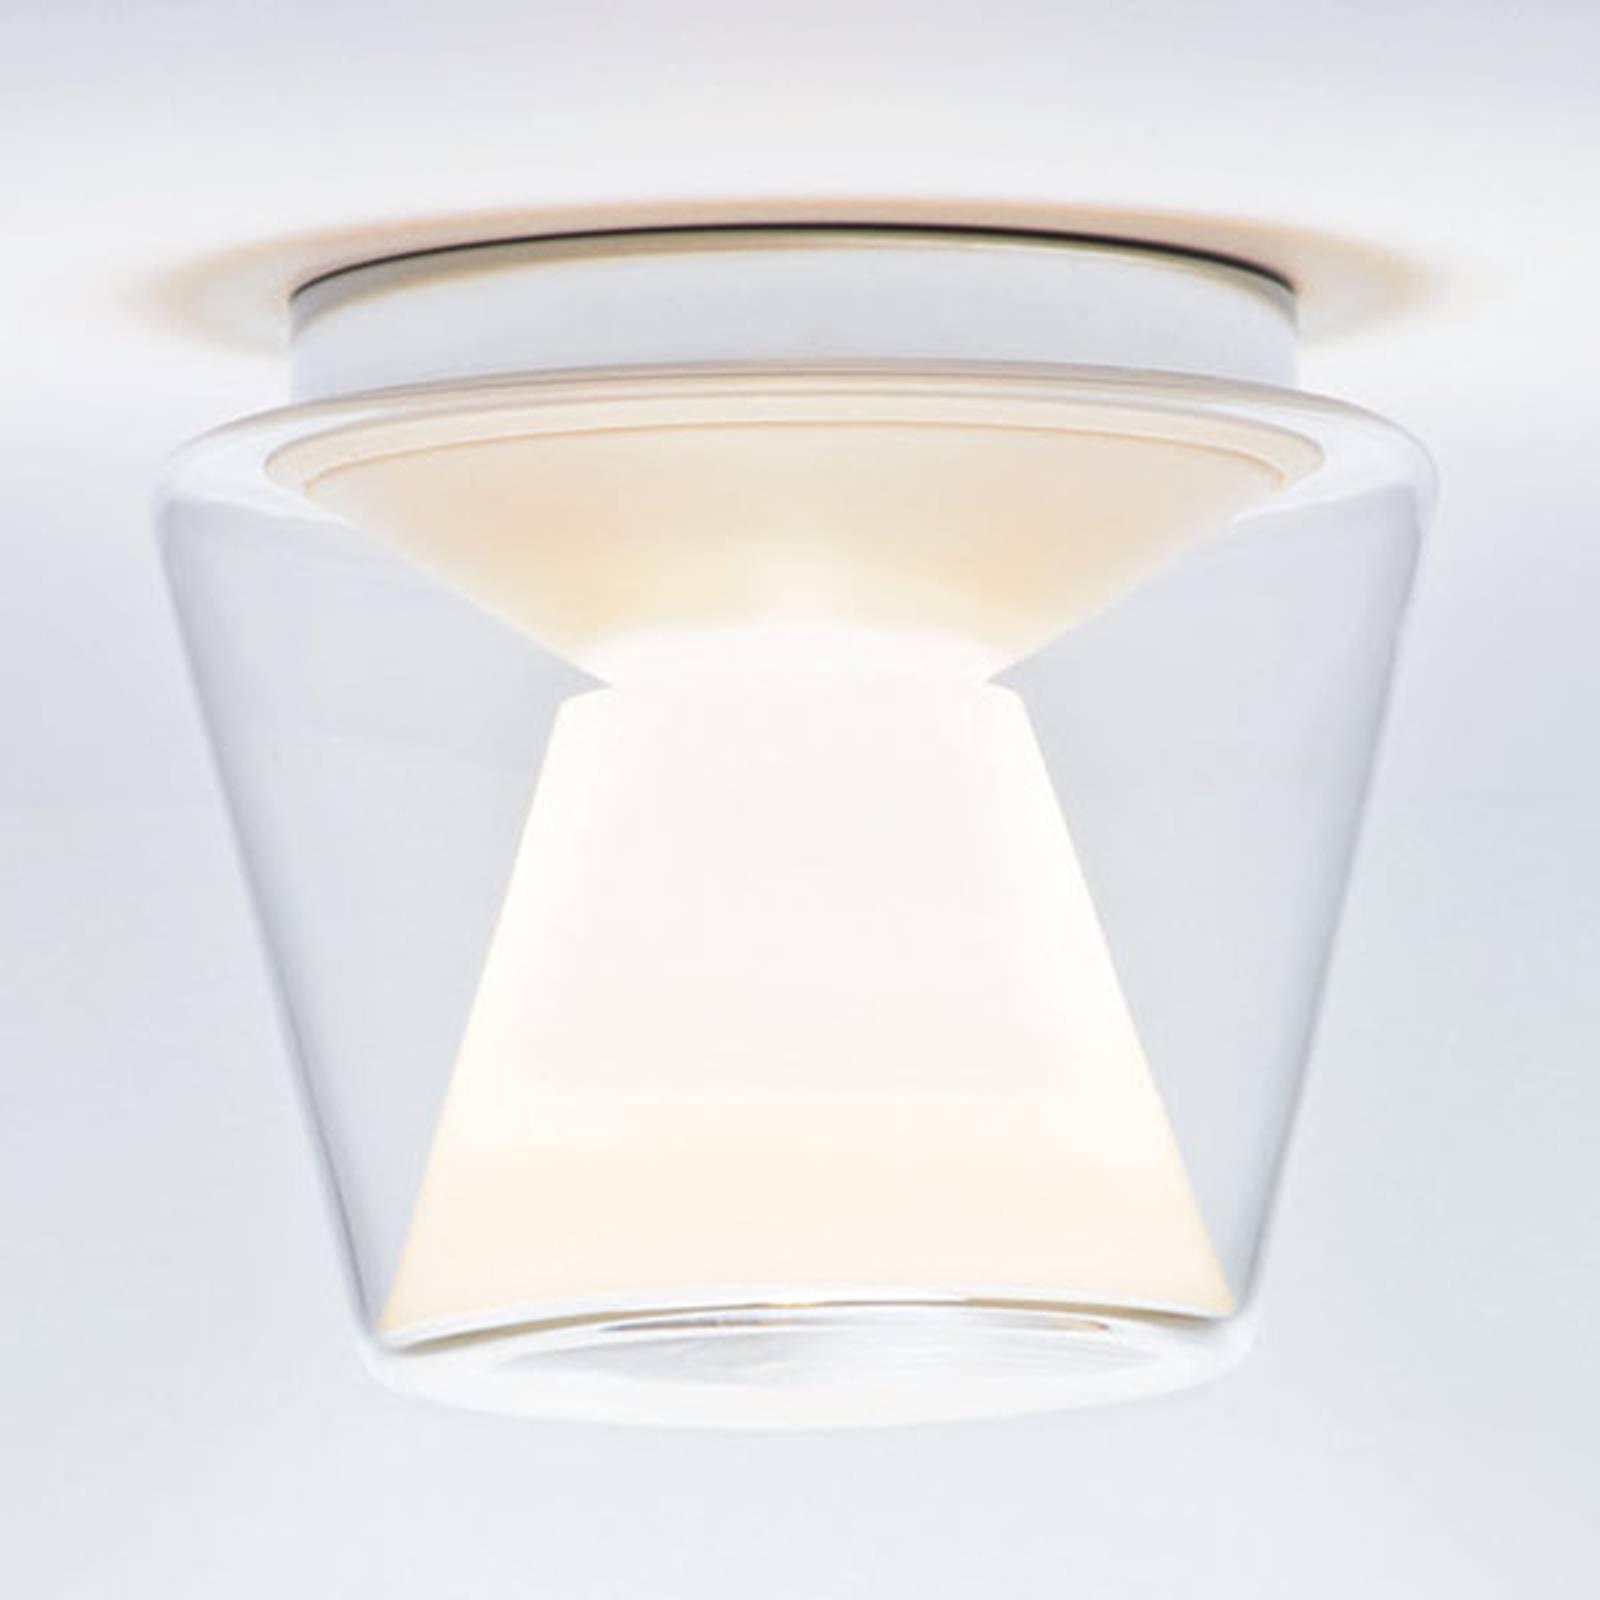 serien.lighting Annex M - LED plafondlamp, opaal